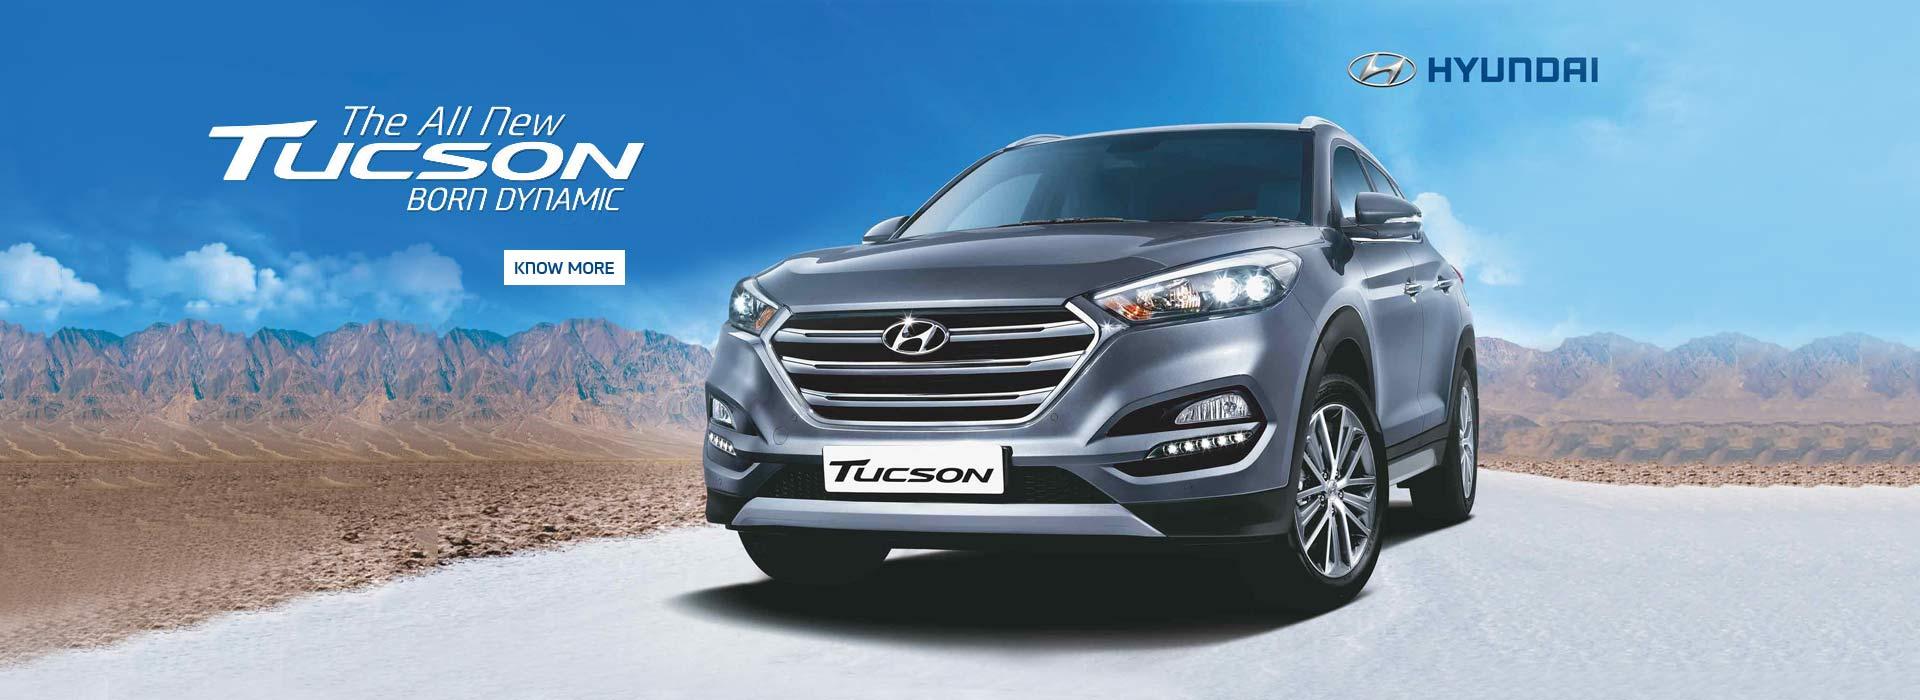 Lakshmi Hyundai Authorized New Car Dealership Serving And Servicing